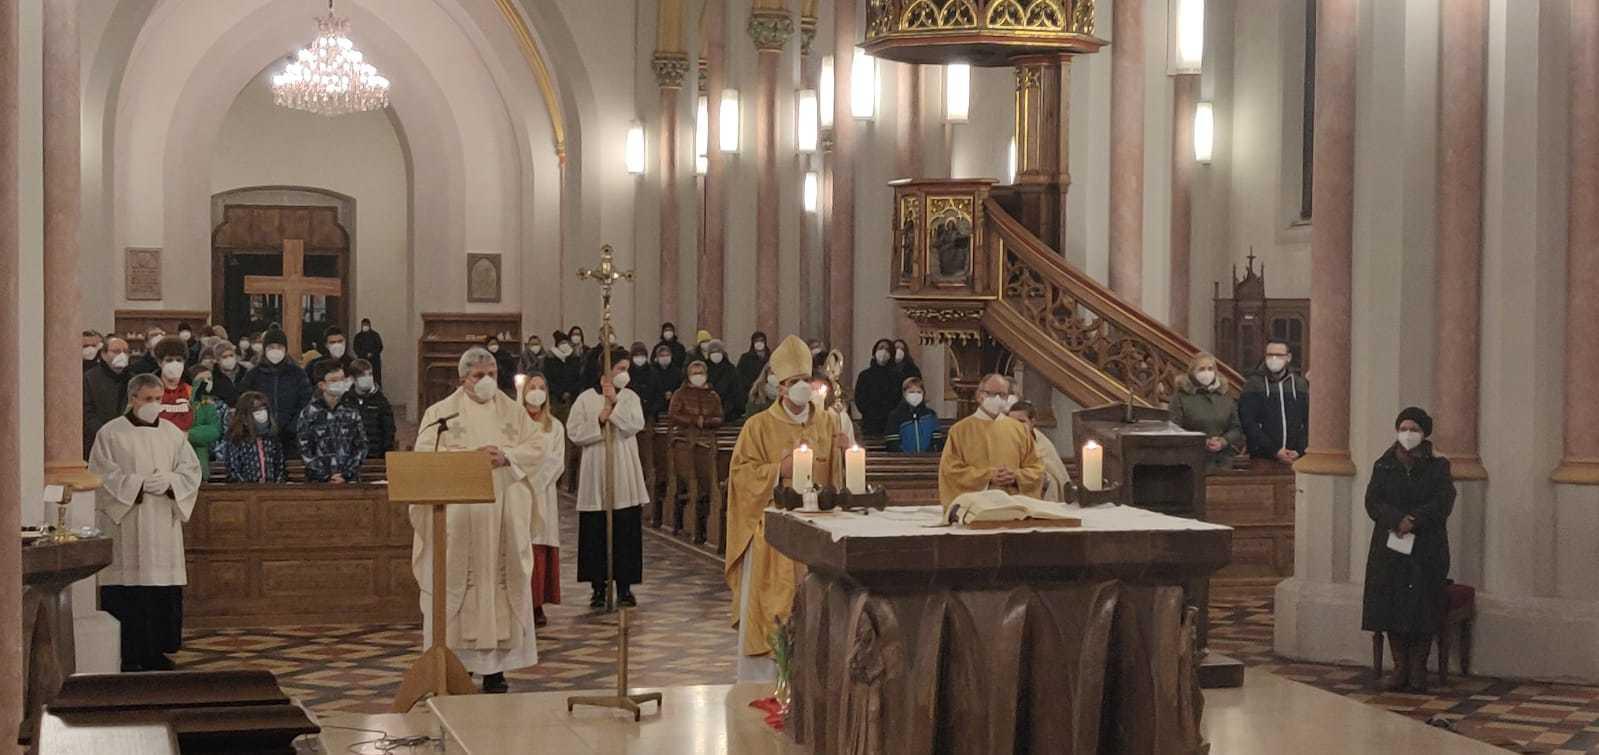 Jugendgottesdienst Johannes Bosco Bildquelle Carl Christian Snethlage